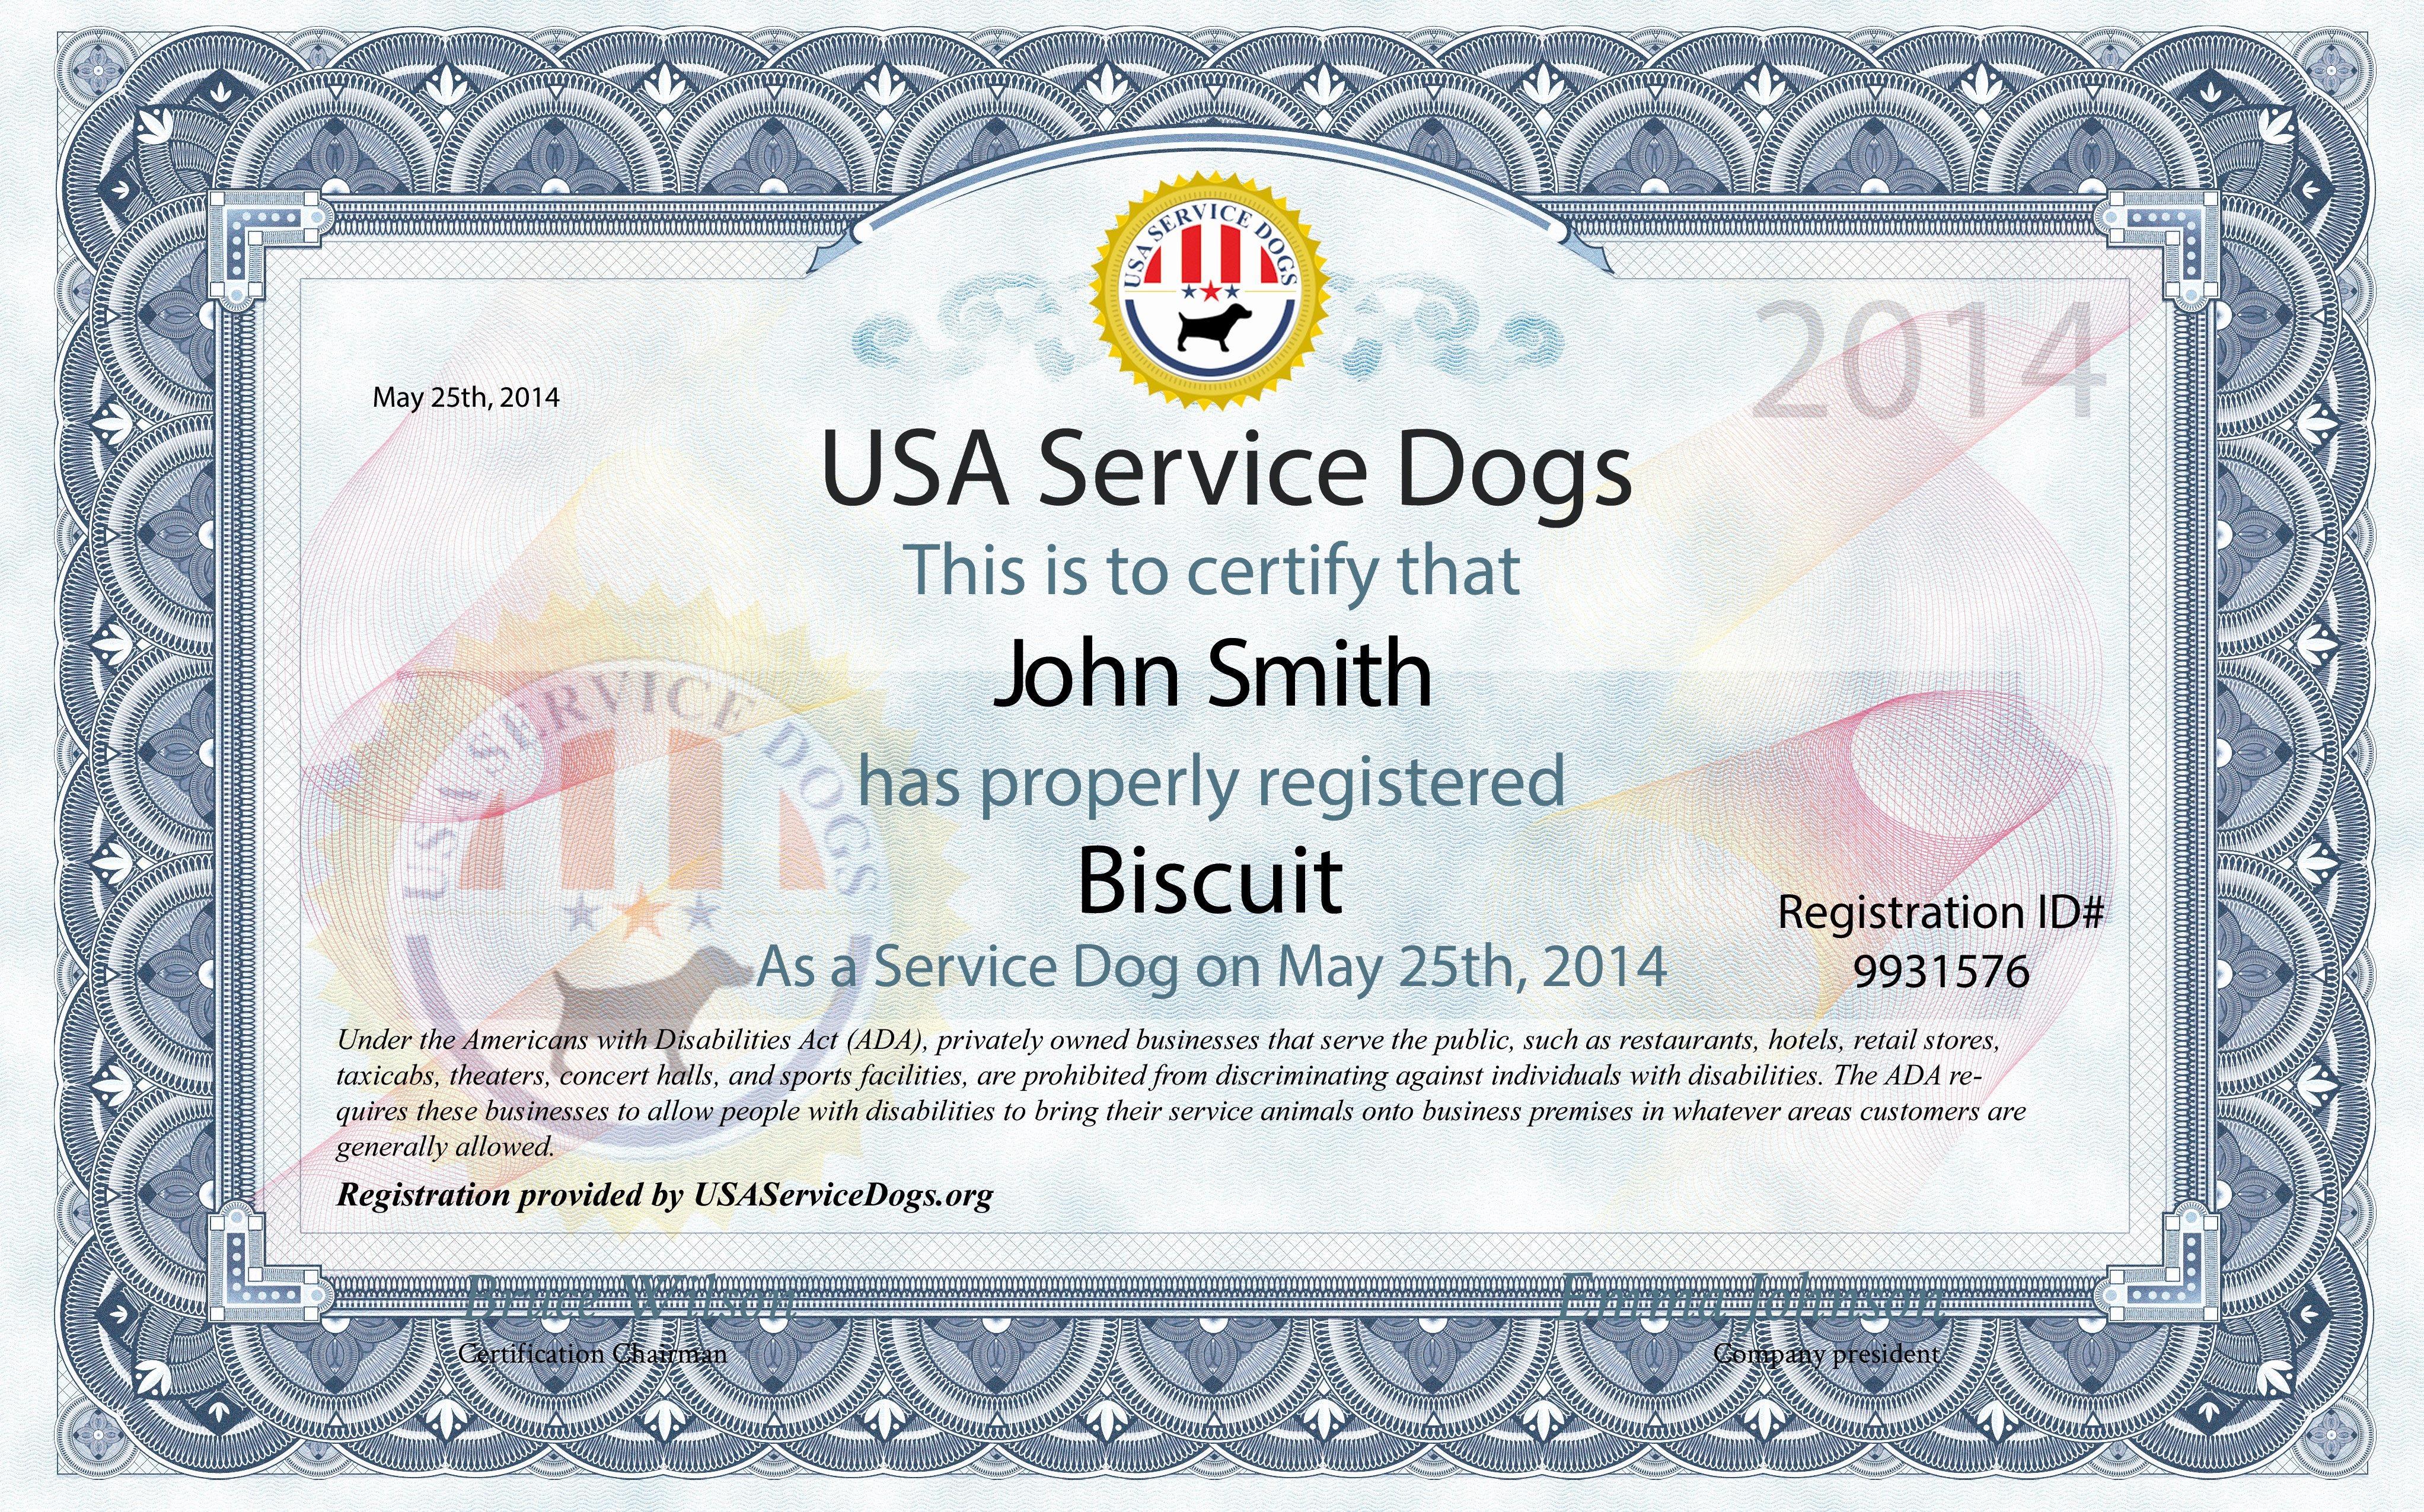 Service Dog Certificate Template New Usa Service Dogs order Service Dog Kit